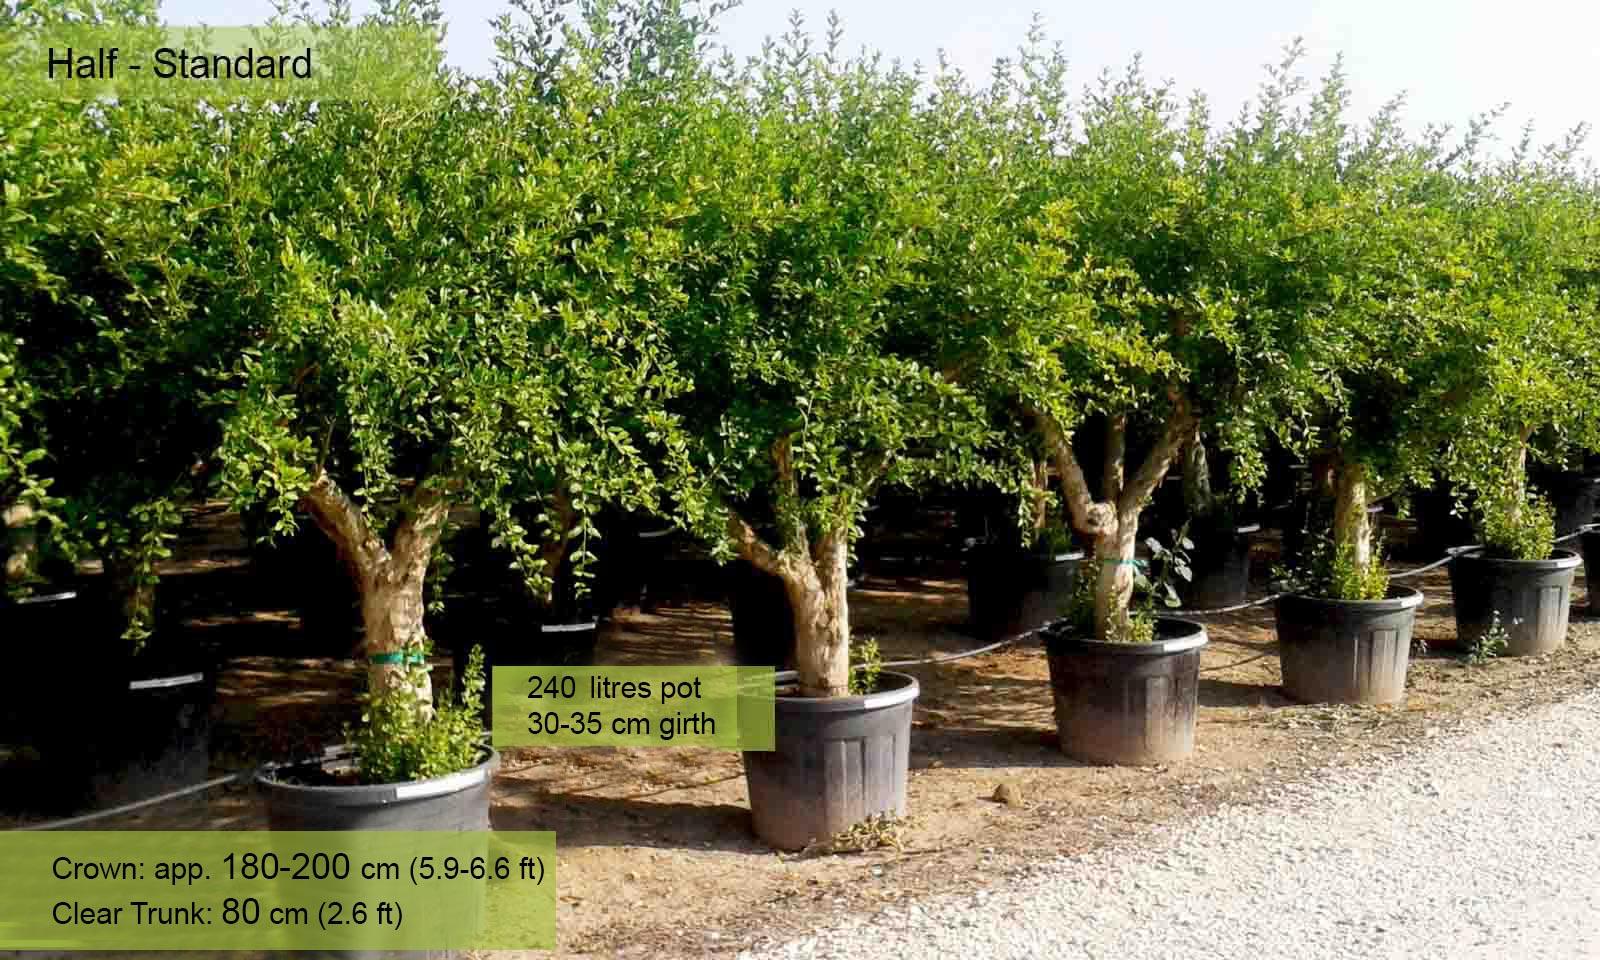 Punica Granatum (Pomegranate Tree) - Half standard - Garden Plants Online